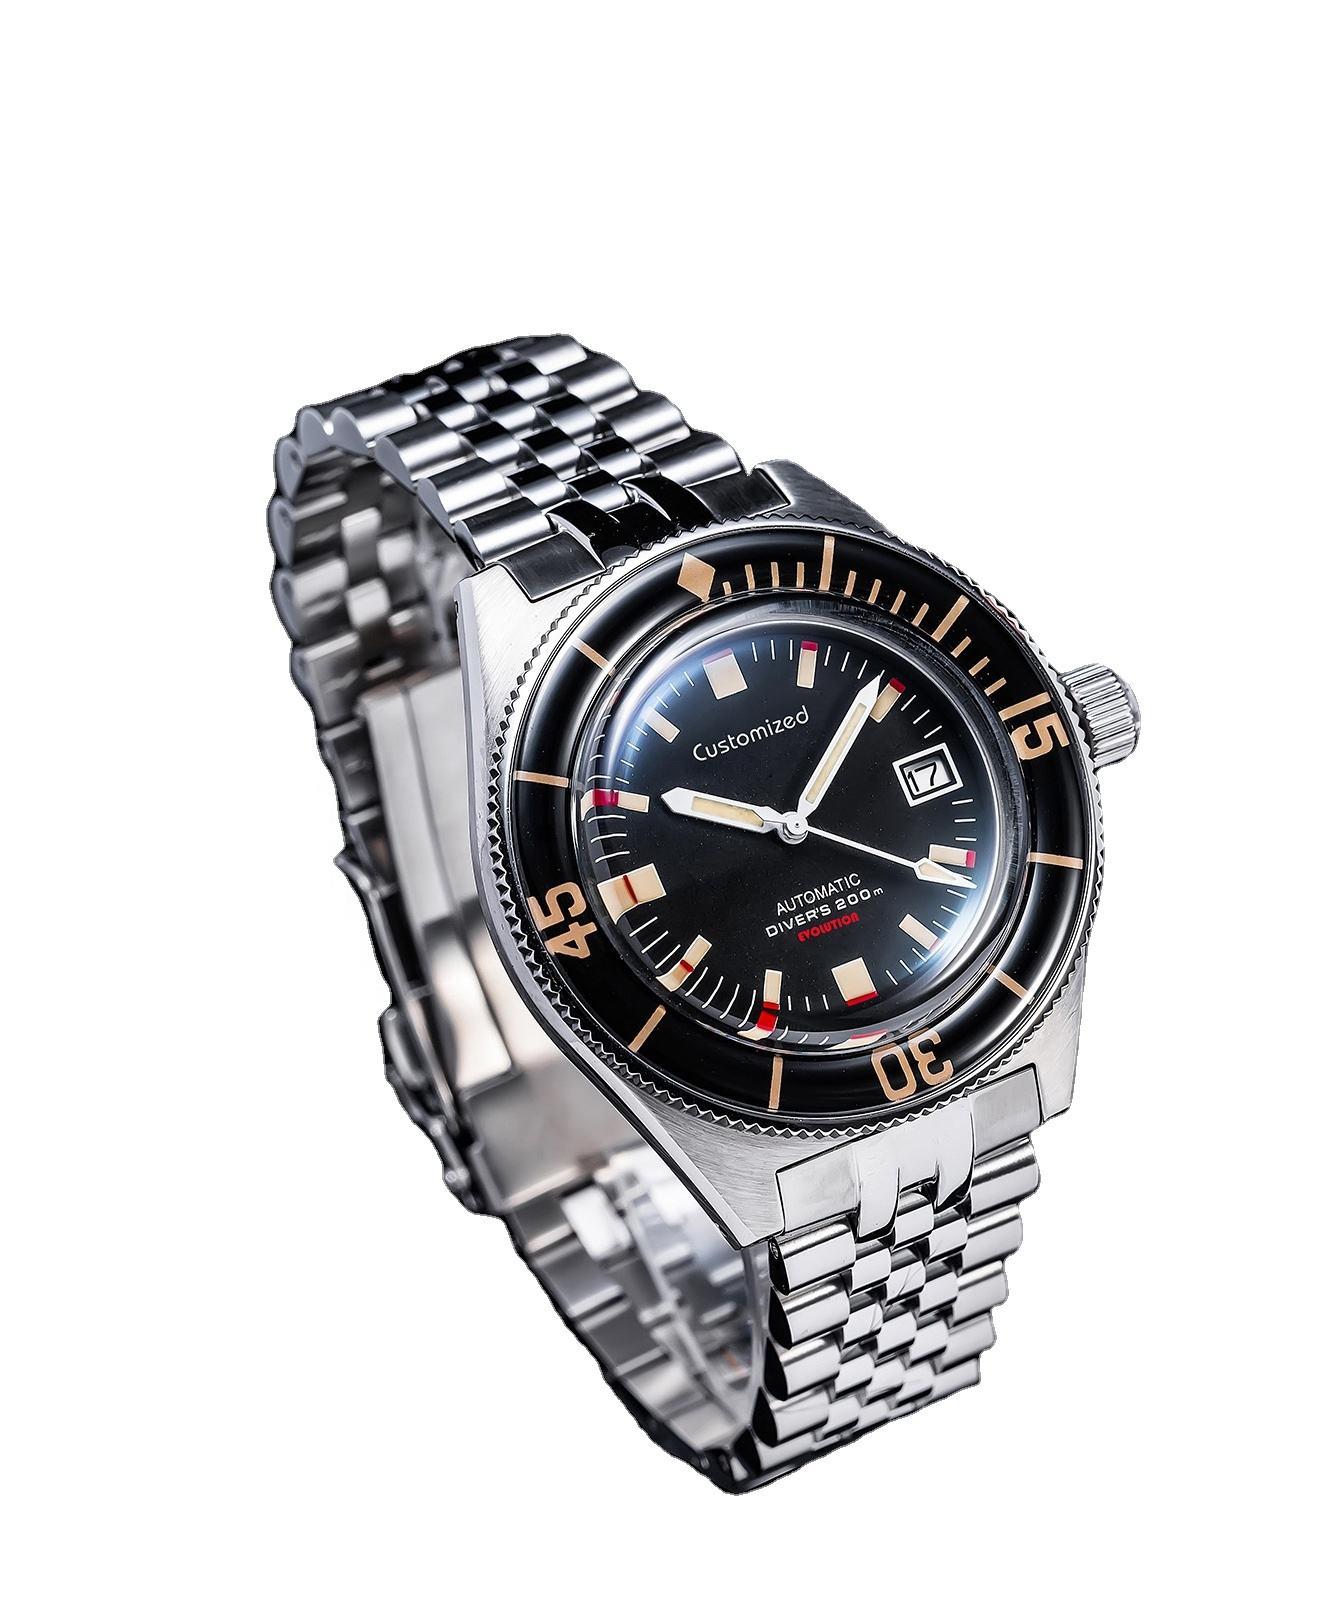 High-quality Fifty Fathoms Style divers Automatic Watch Sapphire Luminous Bezel 20ATM Marine Wrist Watch